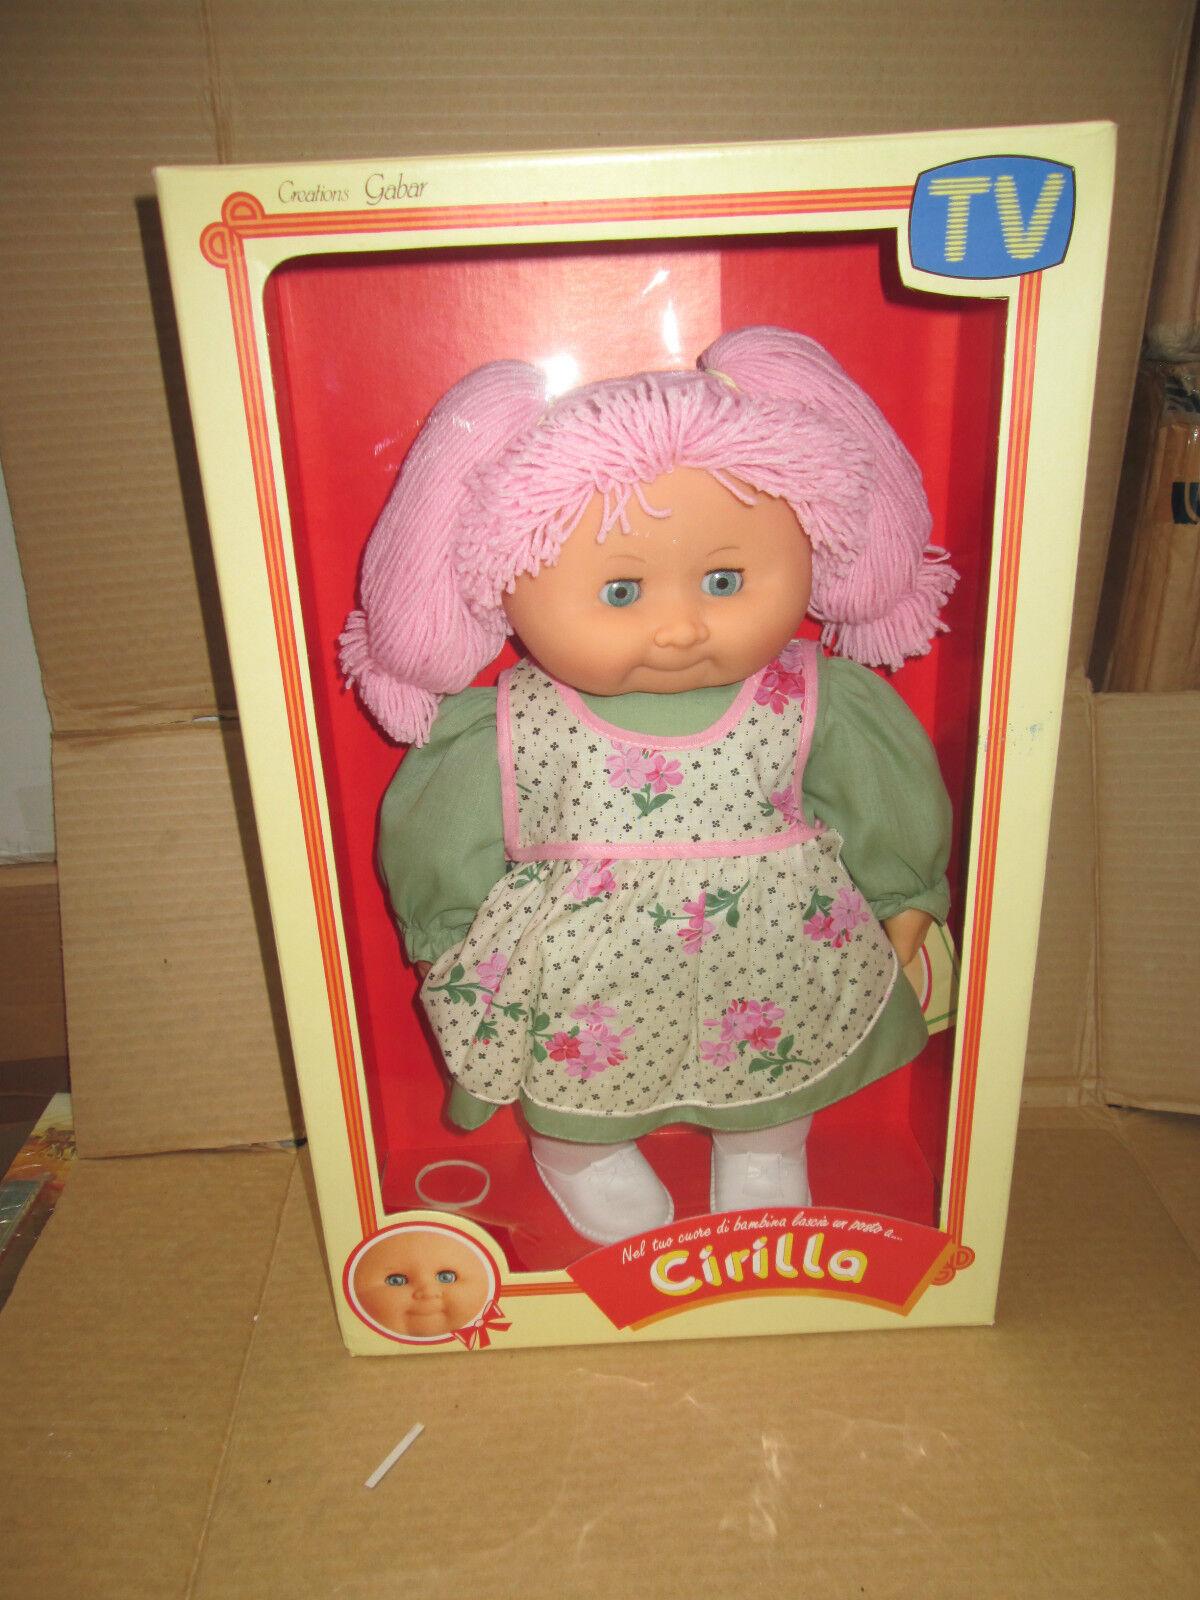 GABAR CIRILLA bambola doll con con con certificato di battesimo CABBAGE PATCH STYLE 1 28660d